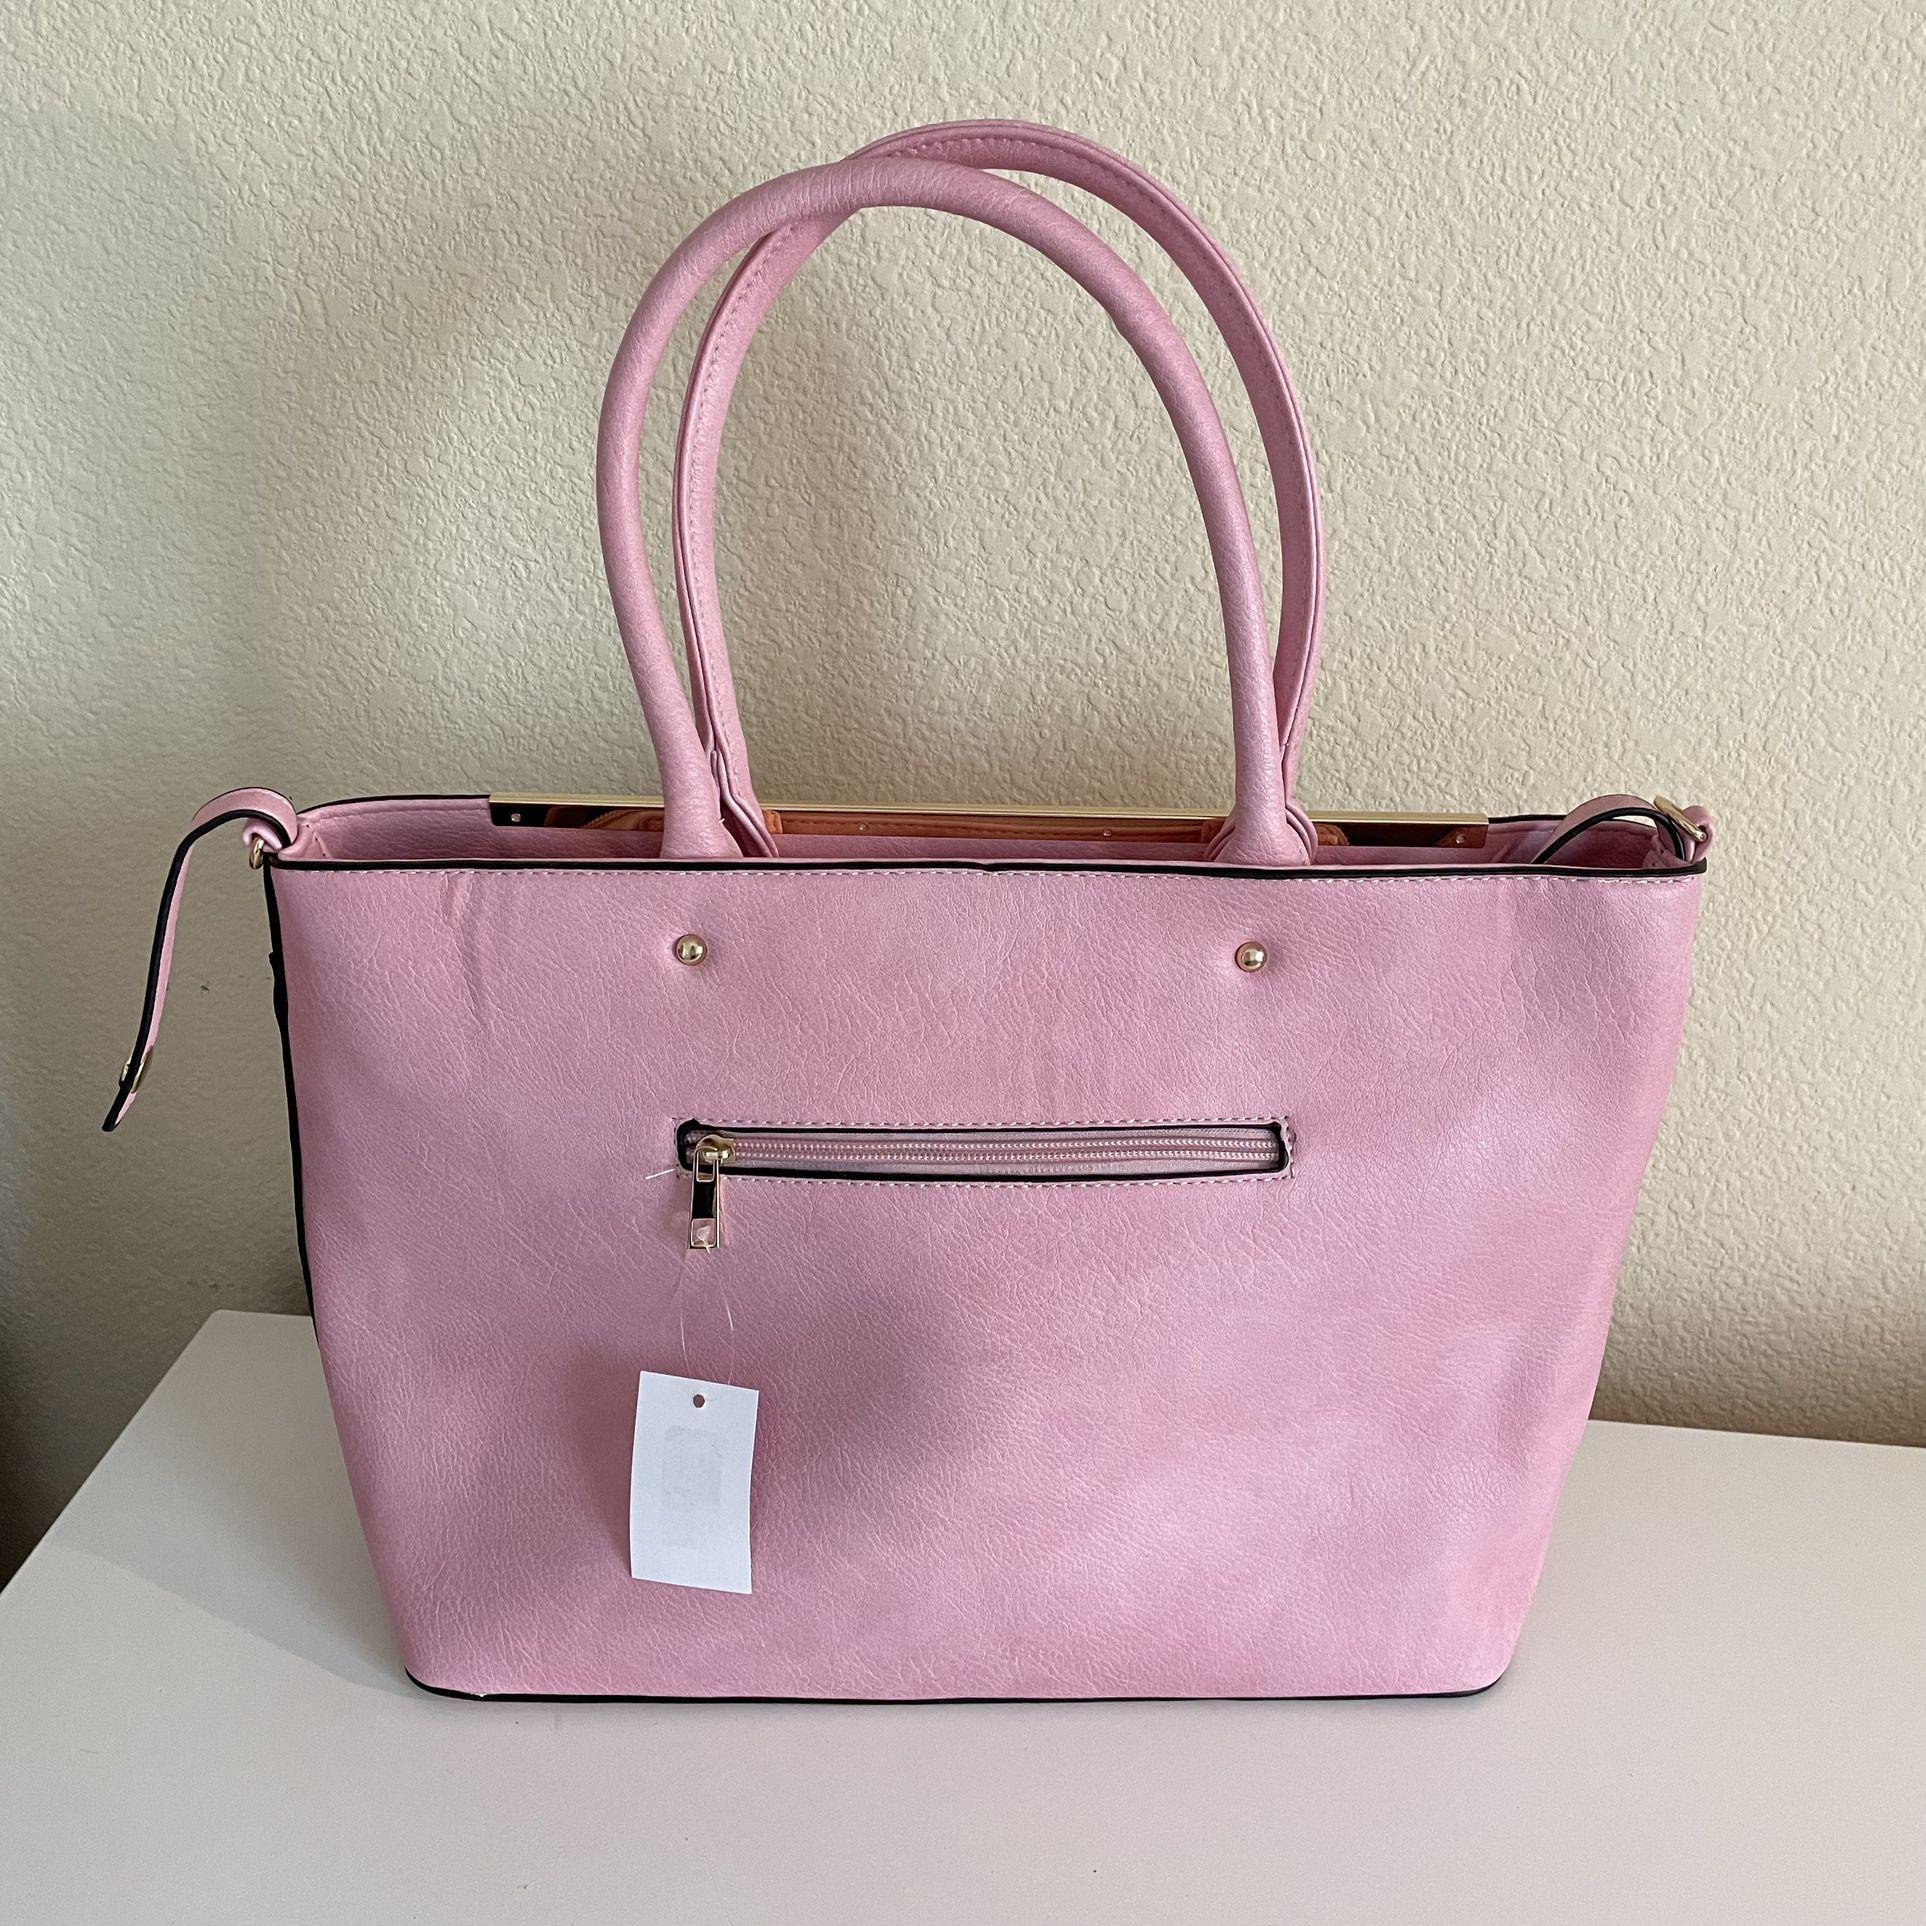 Womens Tote Bag Purse 2 Ways Pink